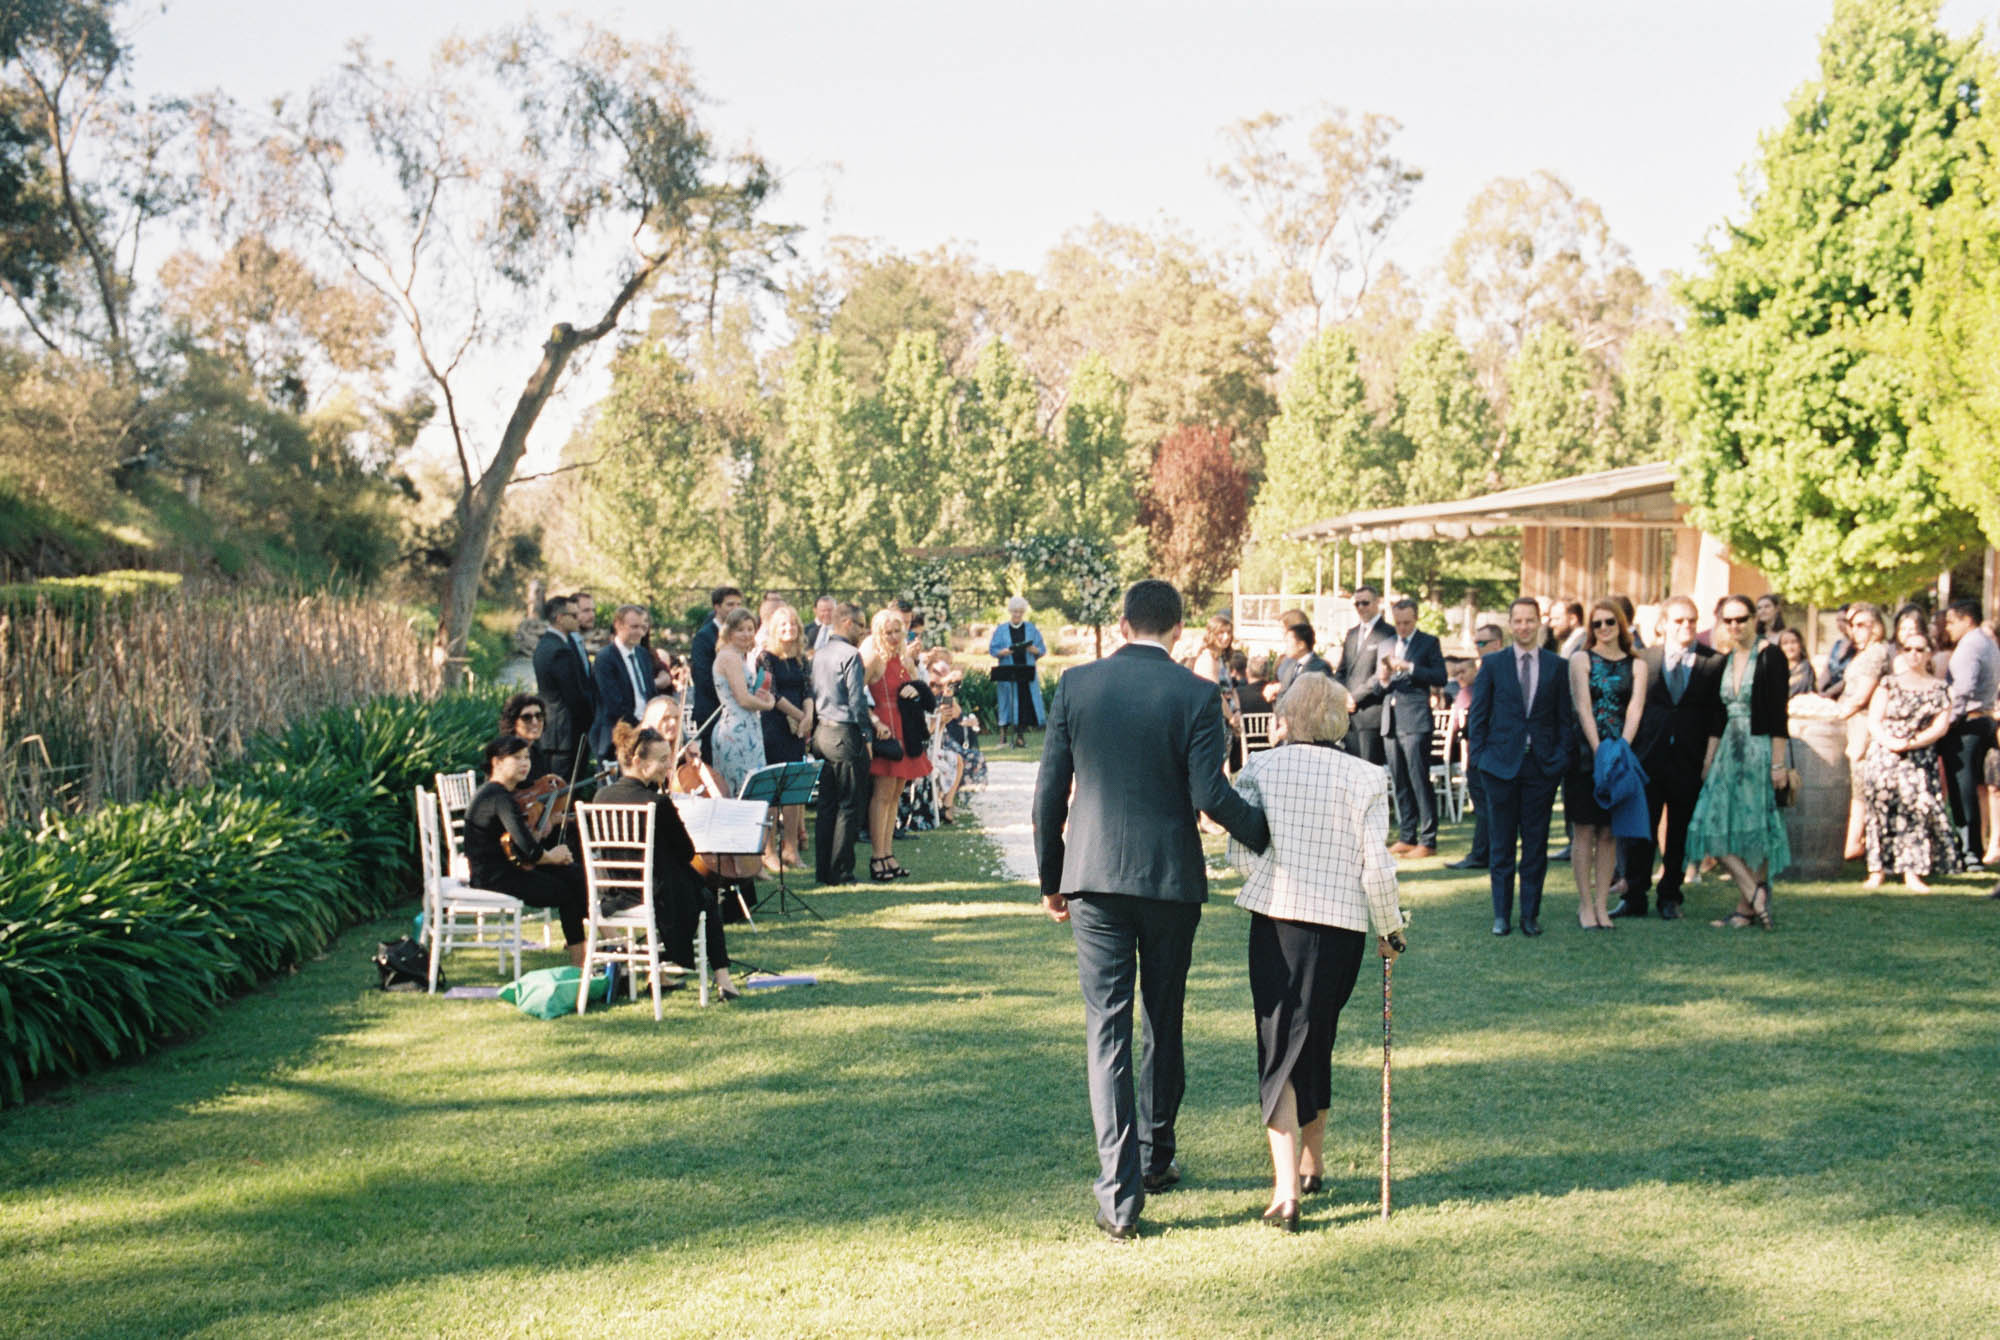 Glen-Ewin-Estate-wedding-photography-030.jpg